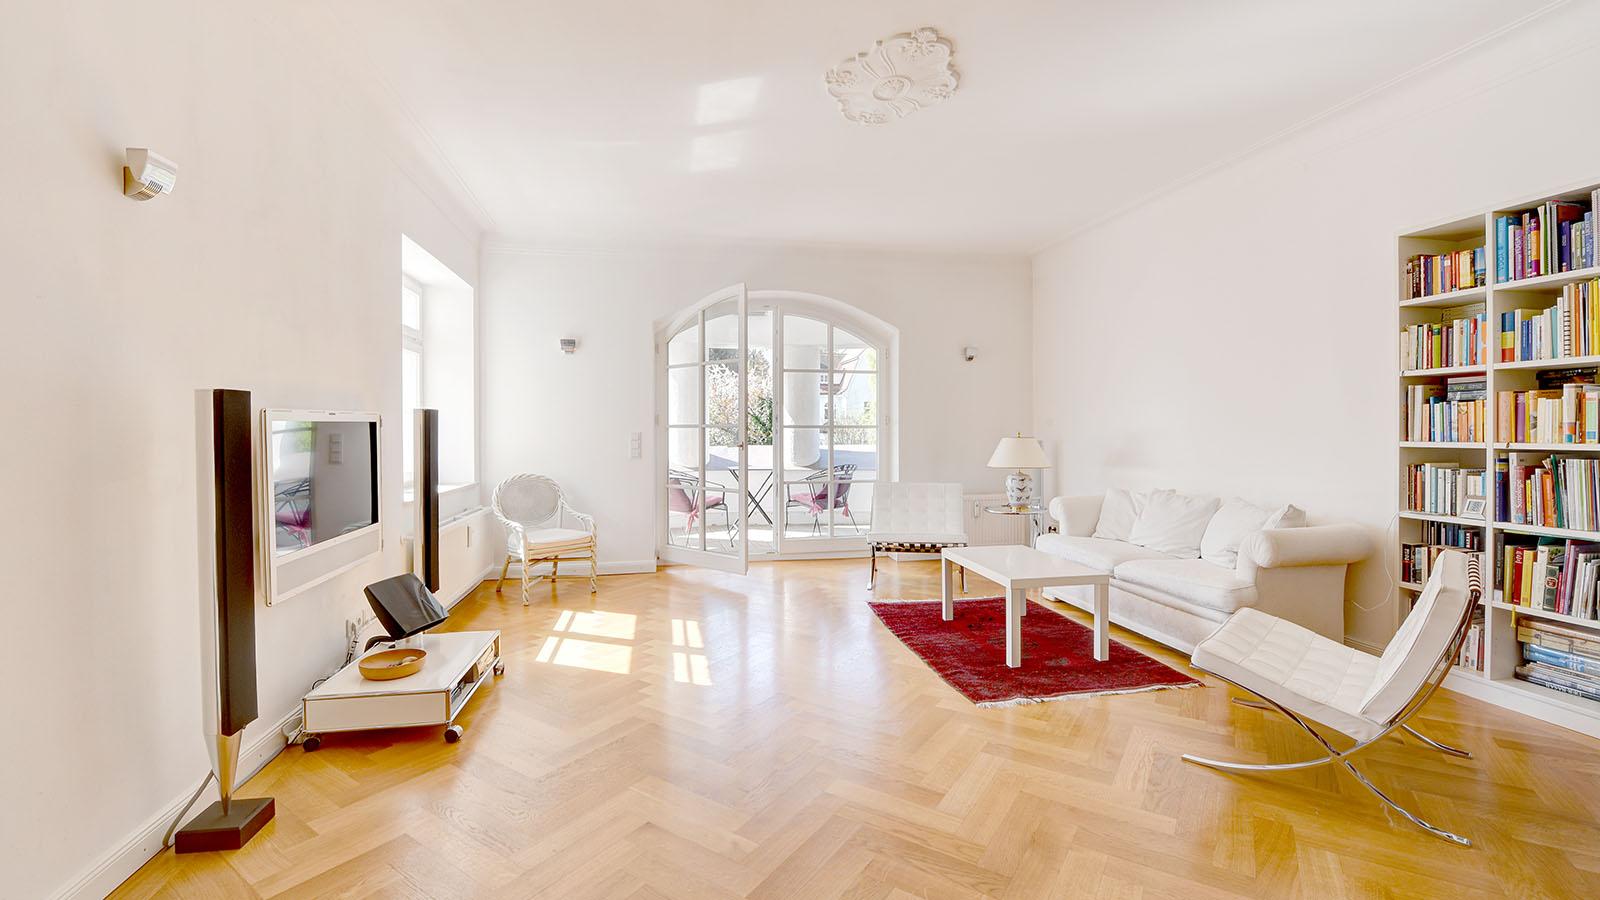 m nchen alt solln denkmalrarit t im k nstlerviertel streifzug media gmbh. Black Bedroom Furniture Sets. Home Design Ideas